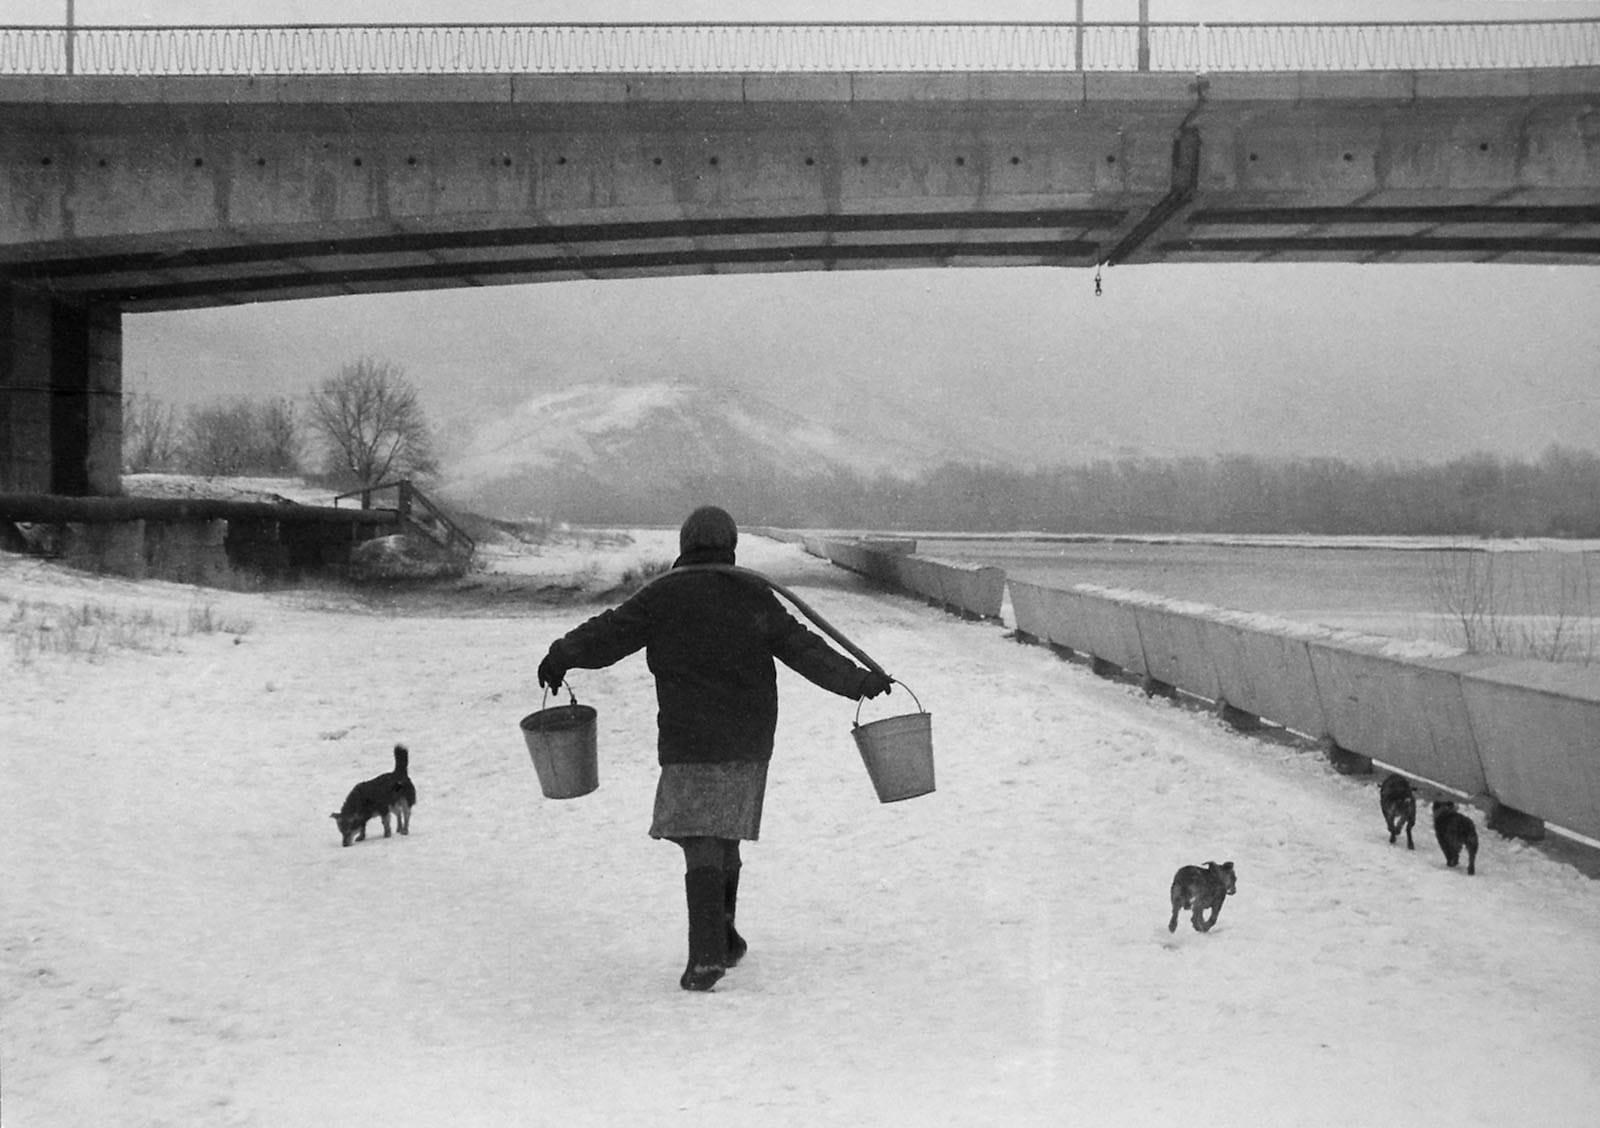 Wasser holen (Ust-Kamenogorsk, 1984)